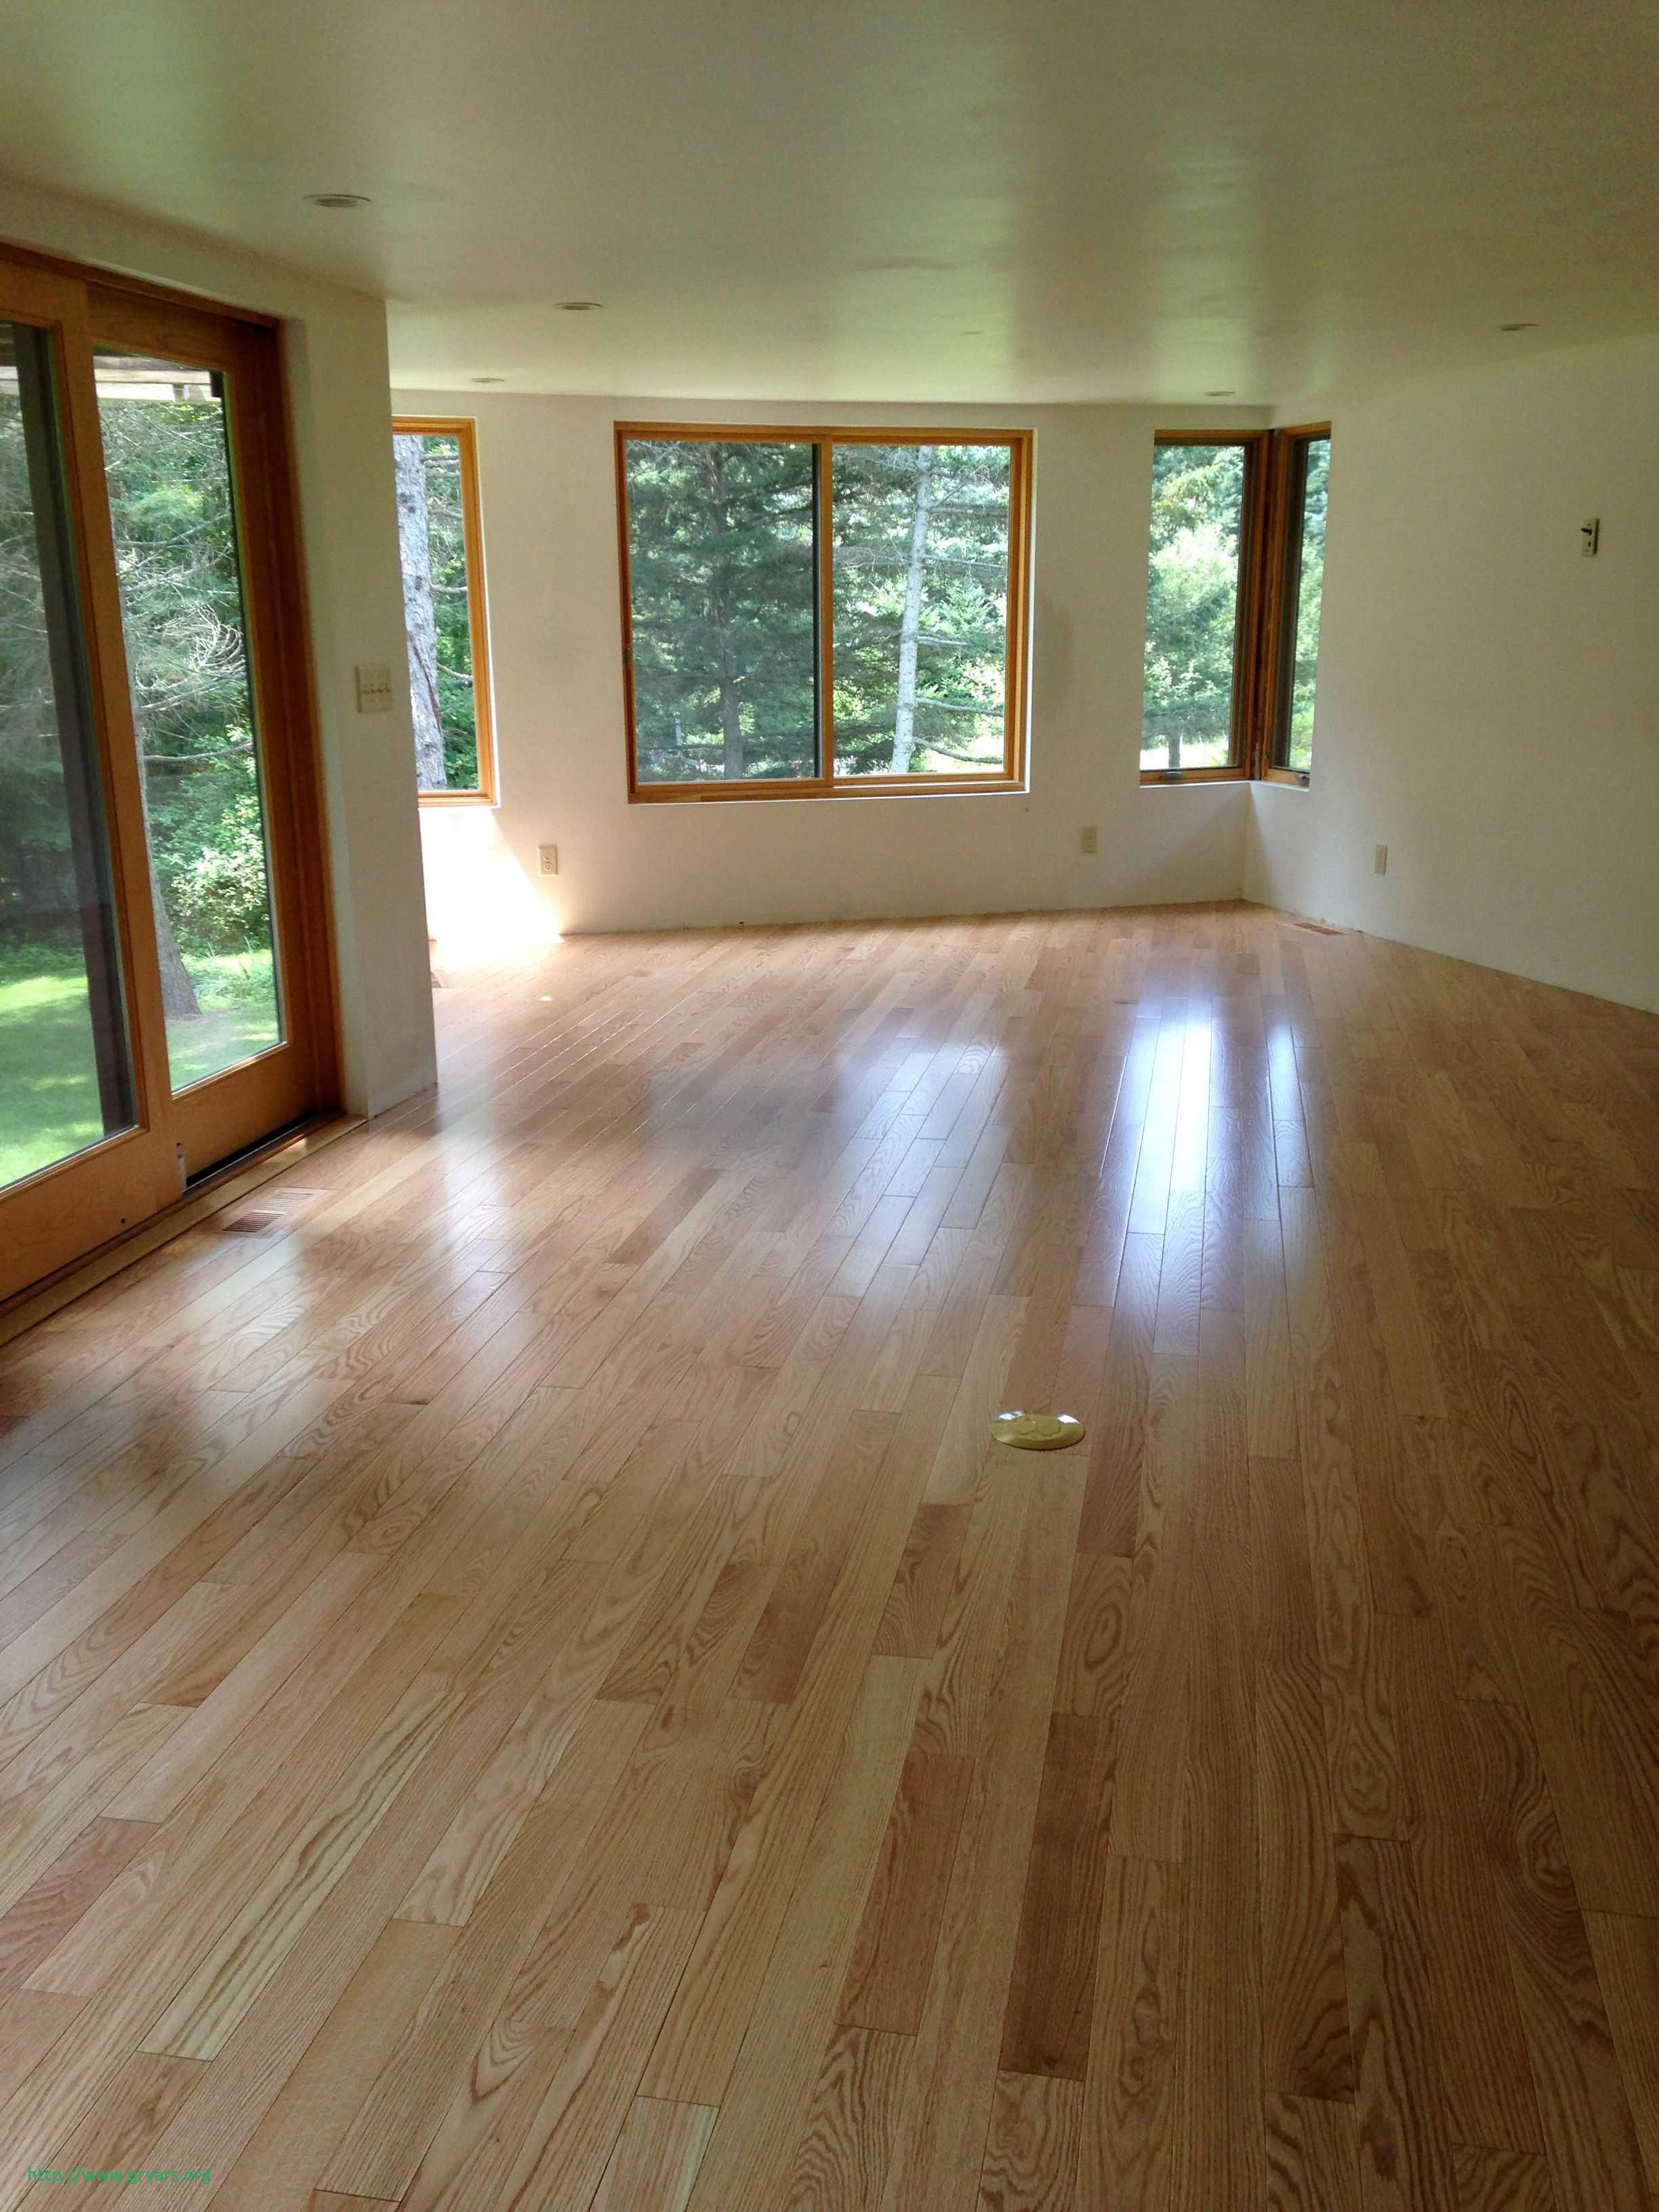 hl hardwood floors of 25 inspirant protective coating for hardwood floors ideas blog with protective coating for hardwood floors beau great methods to use for refinishing hardwood floors